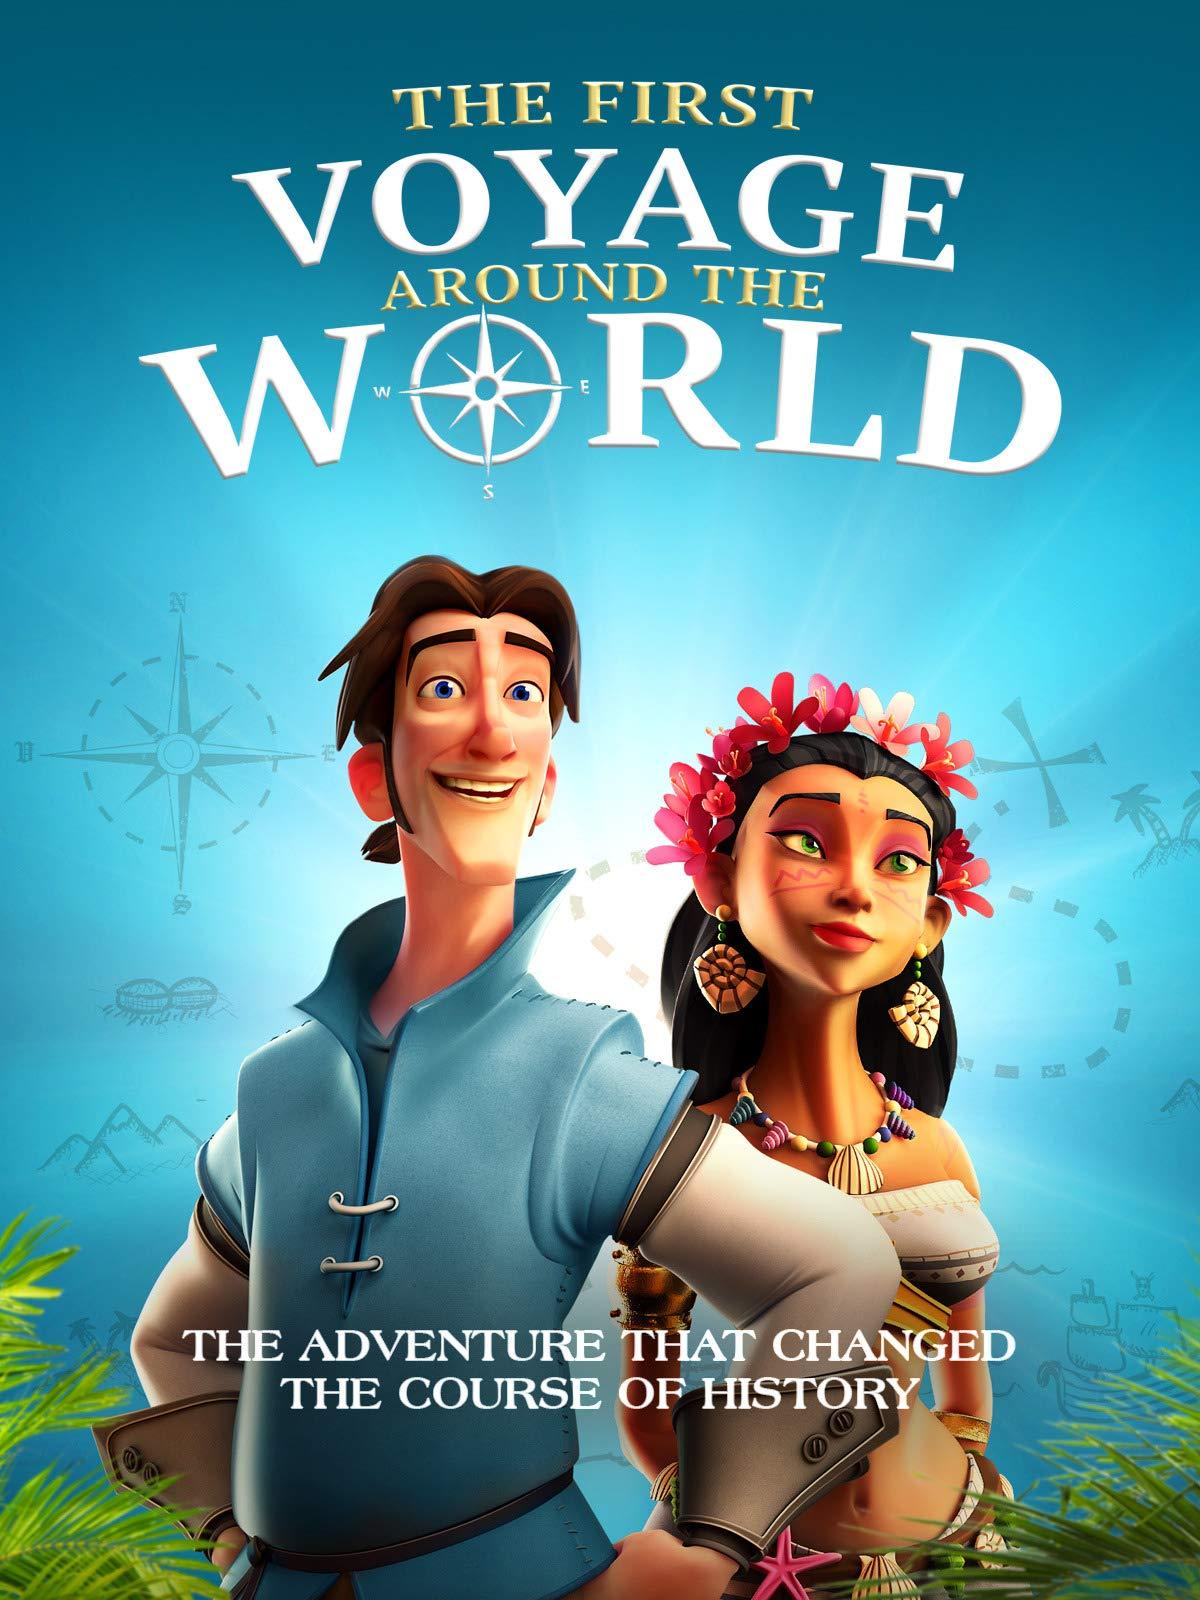 The First Voyage Around the World